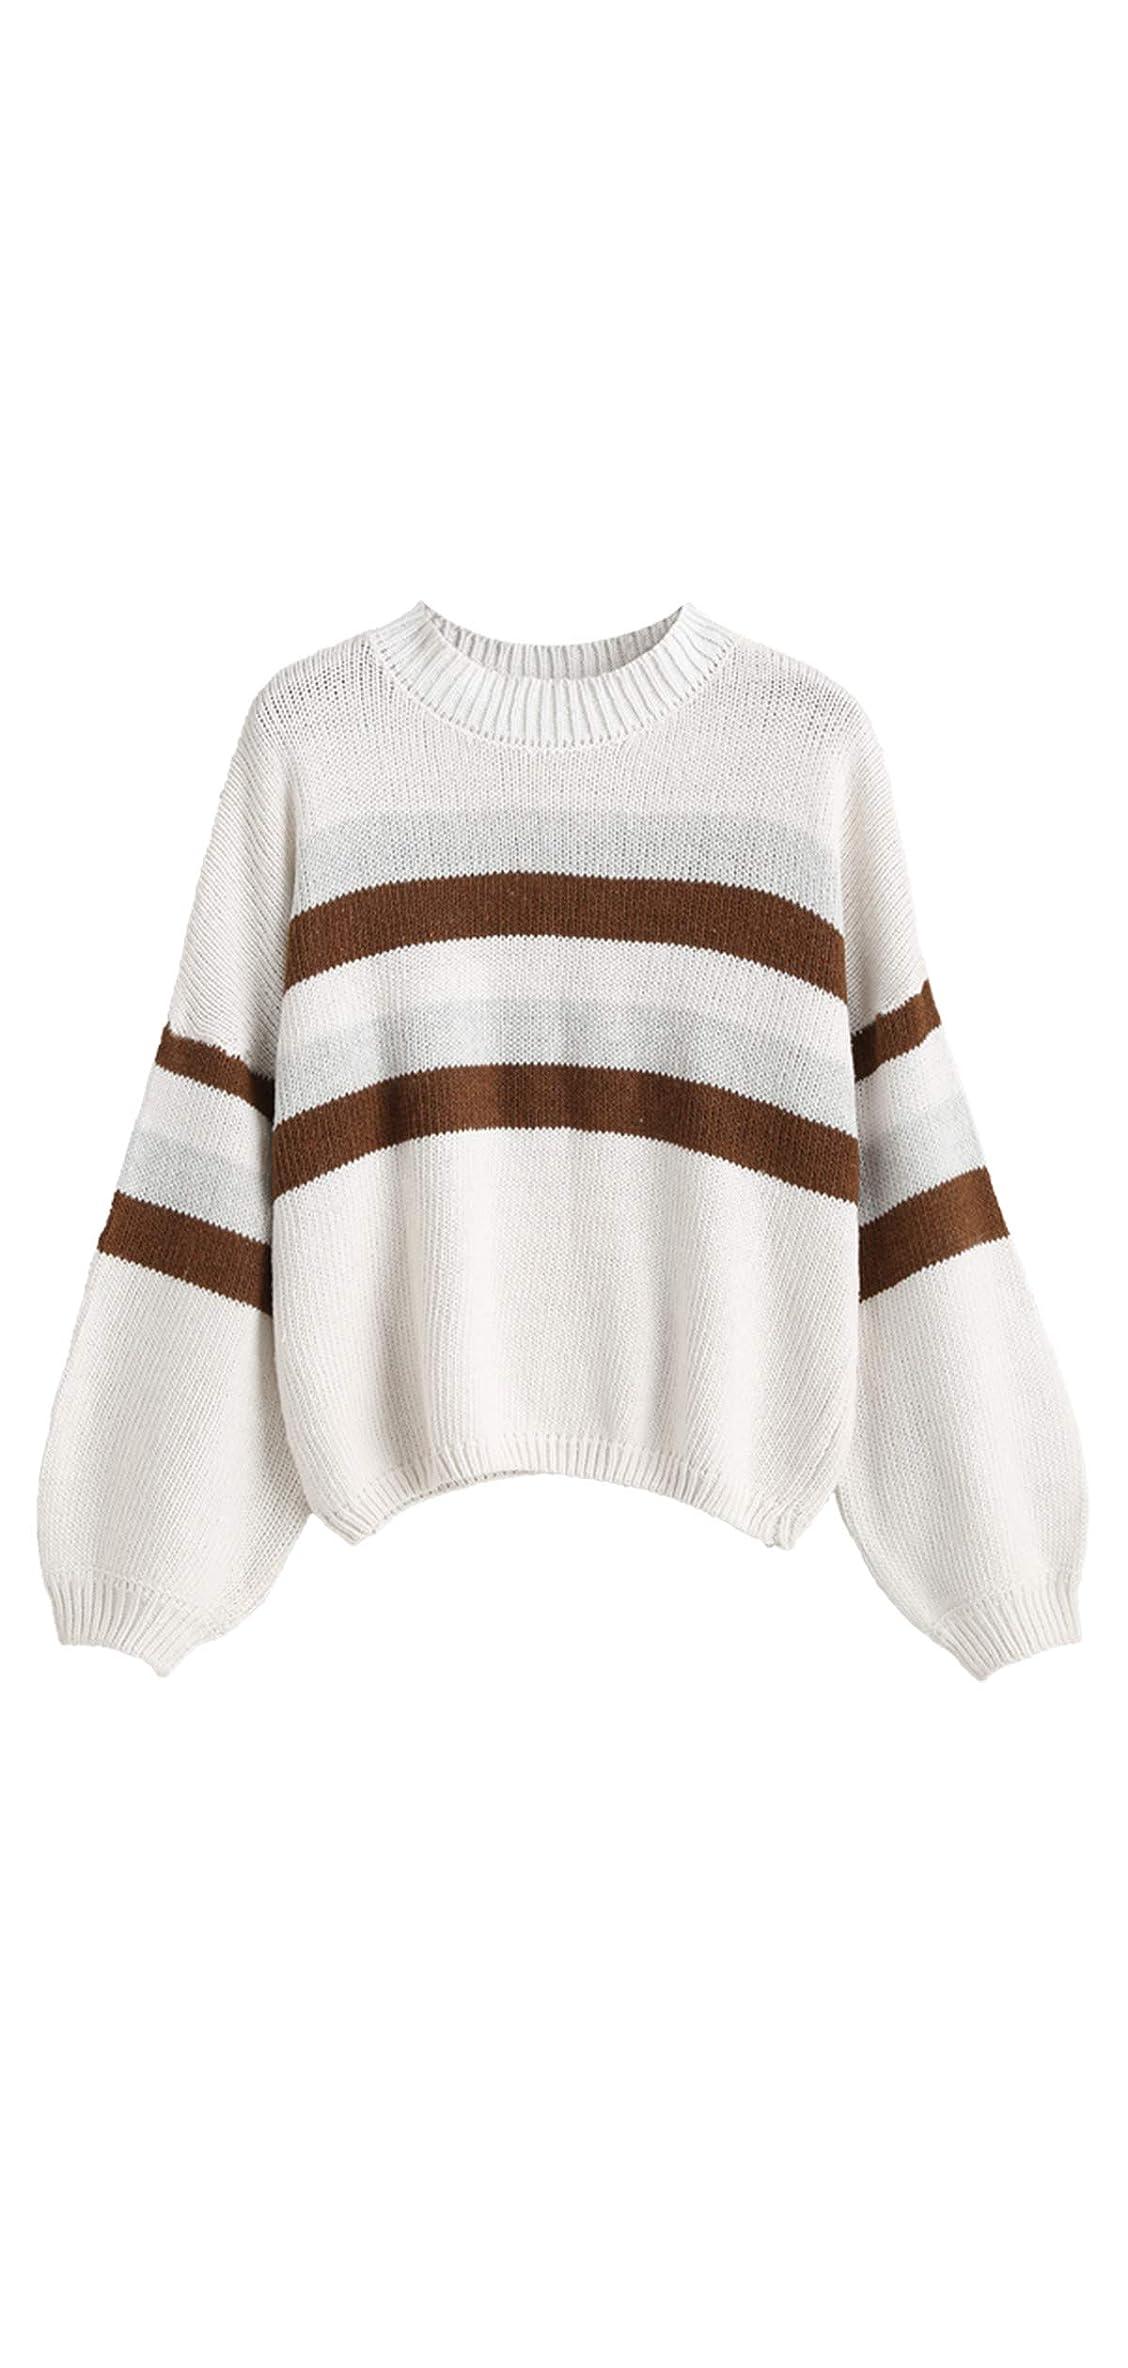 Women's Lantern Sleeve Striped Sweater Crewneck Knit Tops